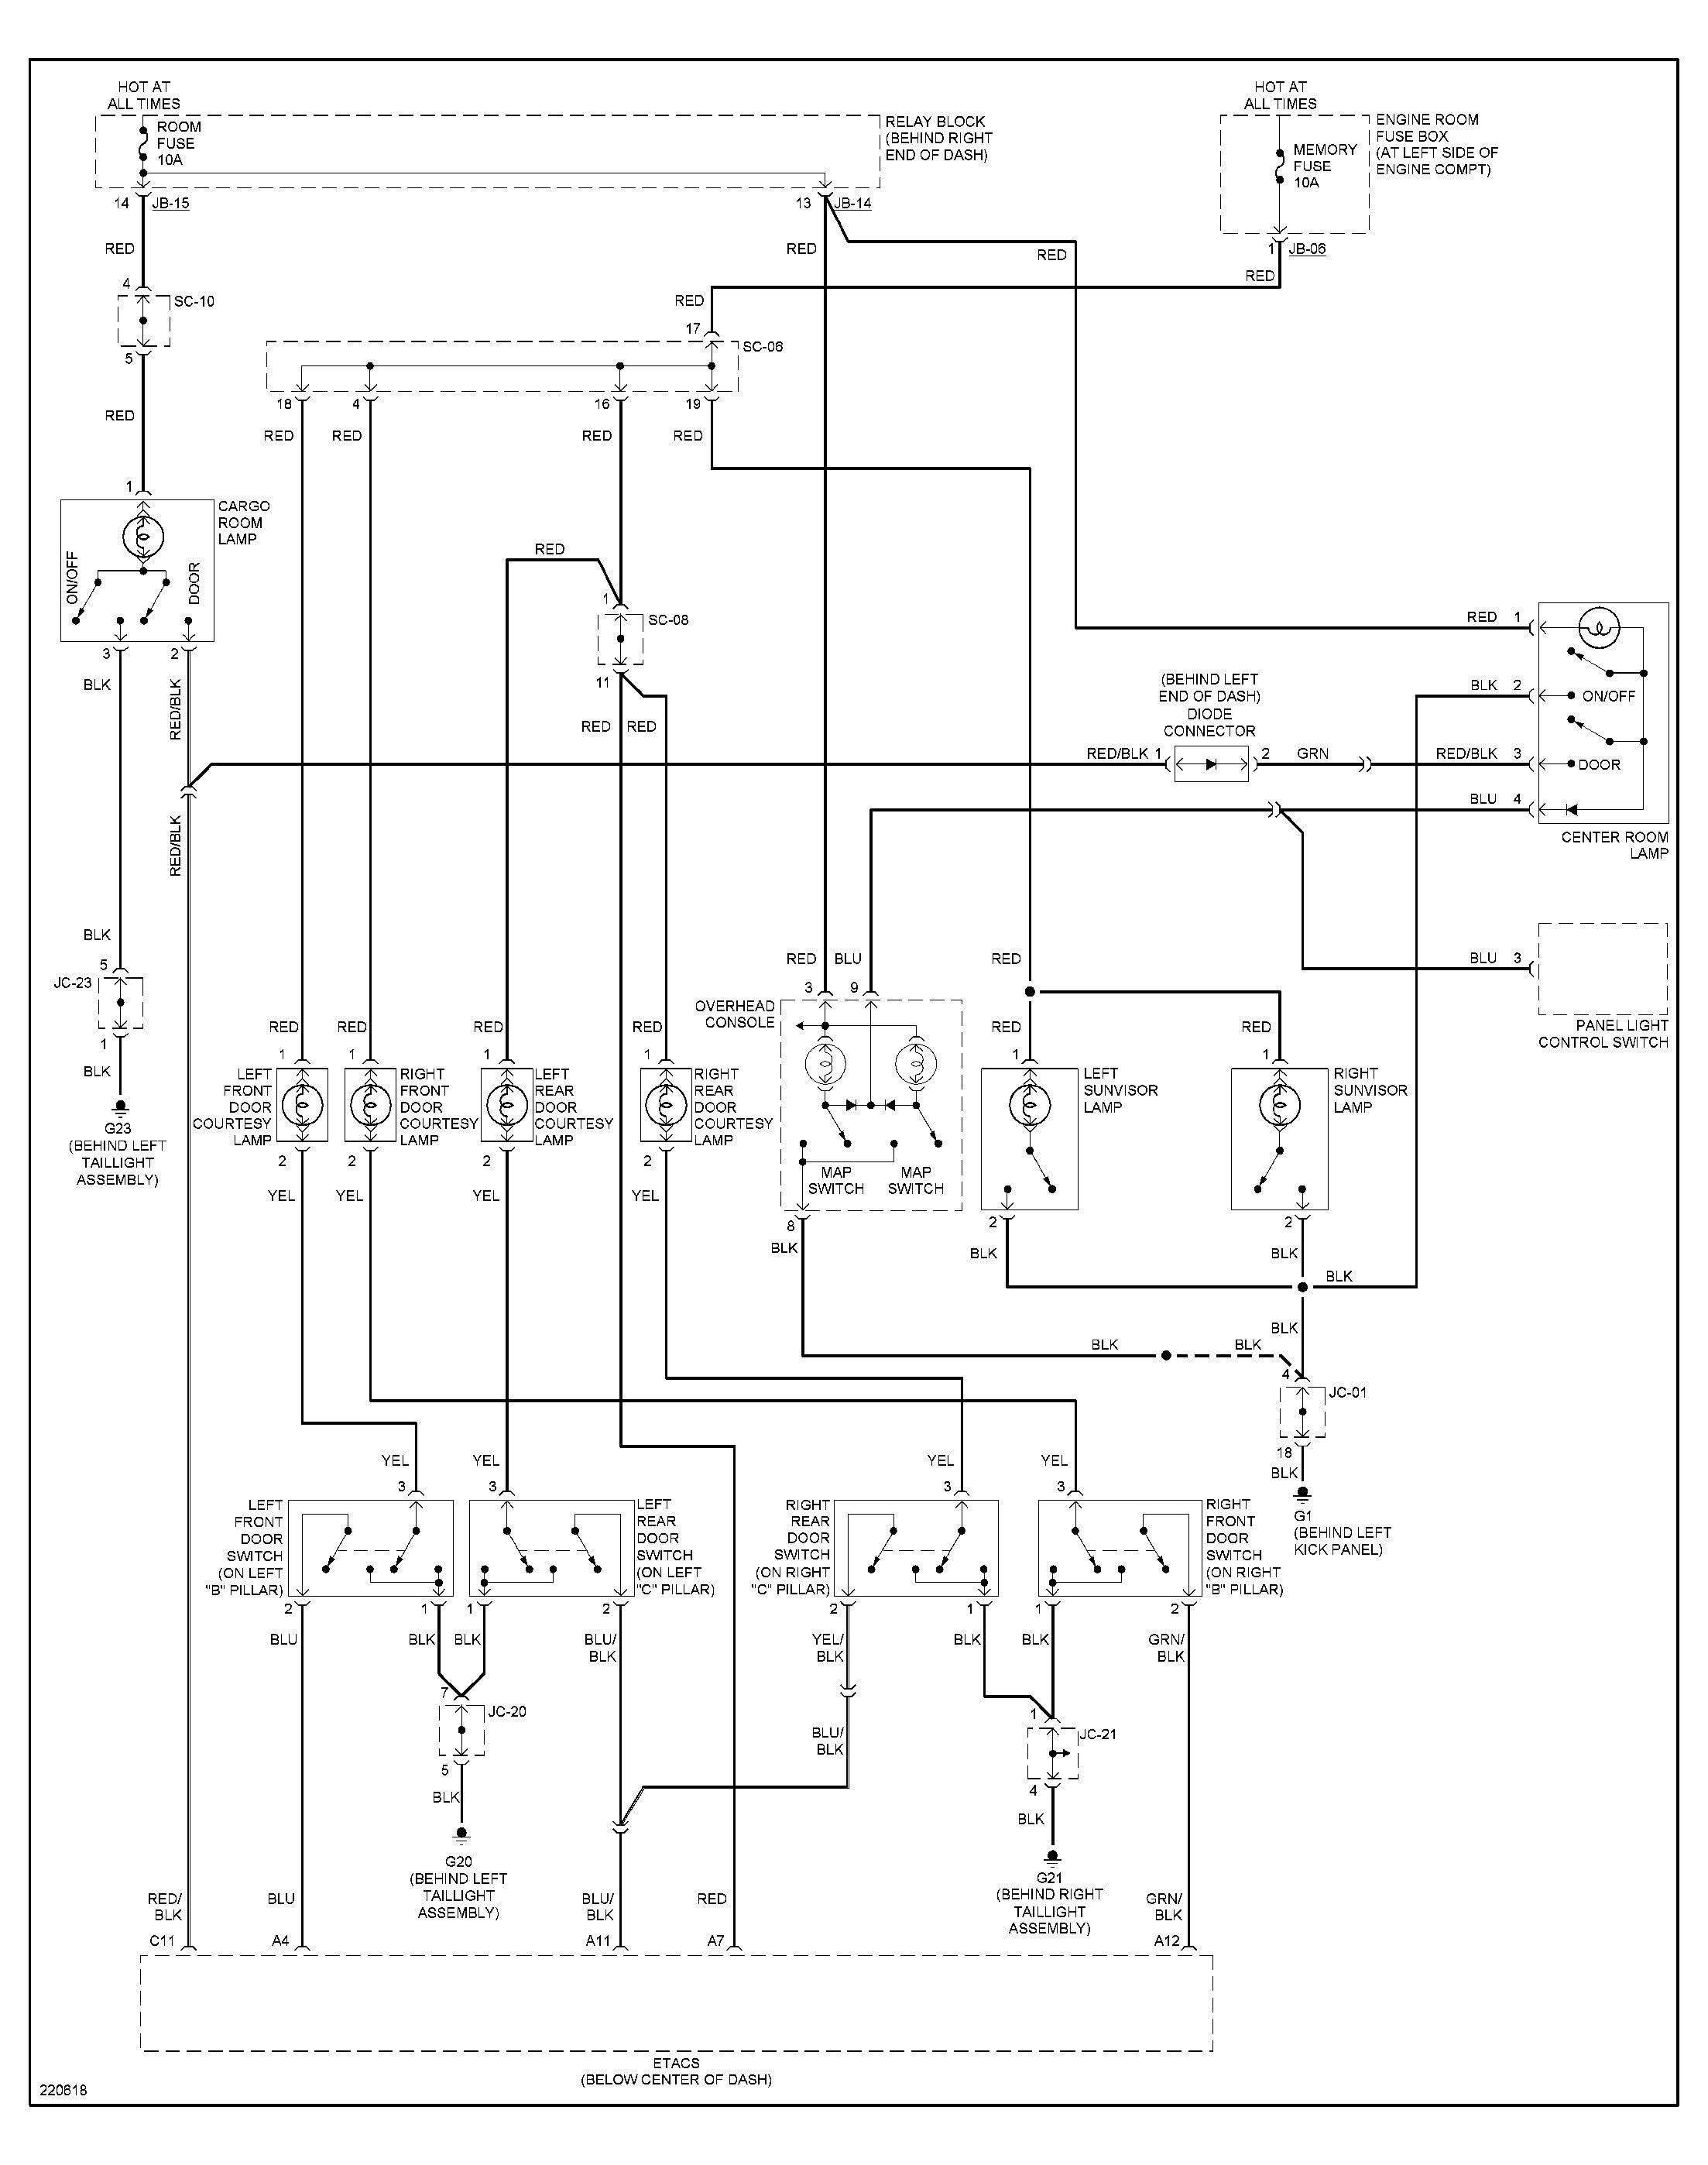 Kia Rio Engine Diagram Kia Sportage Sportage Kia